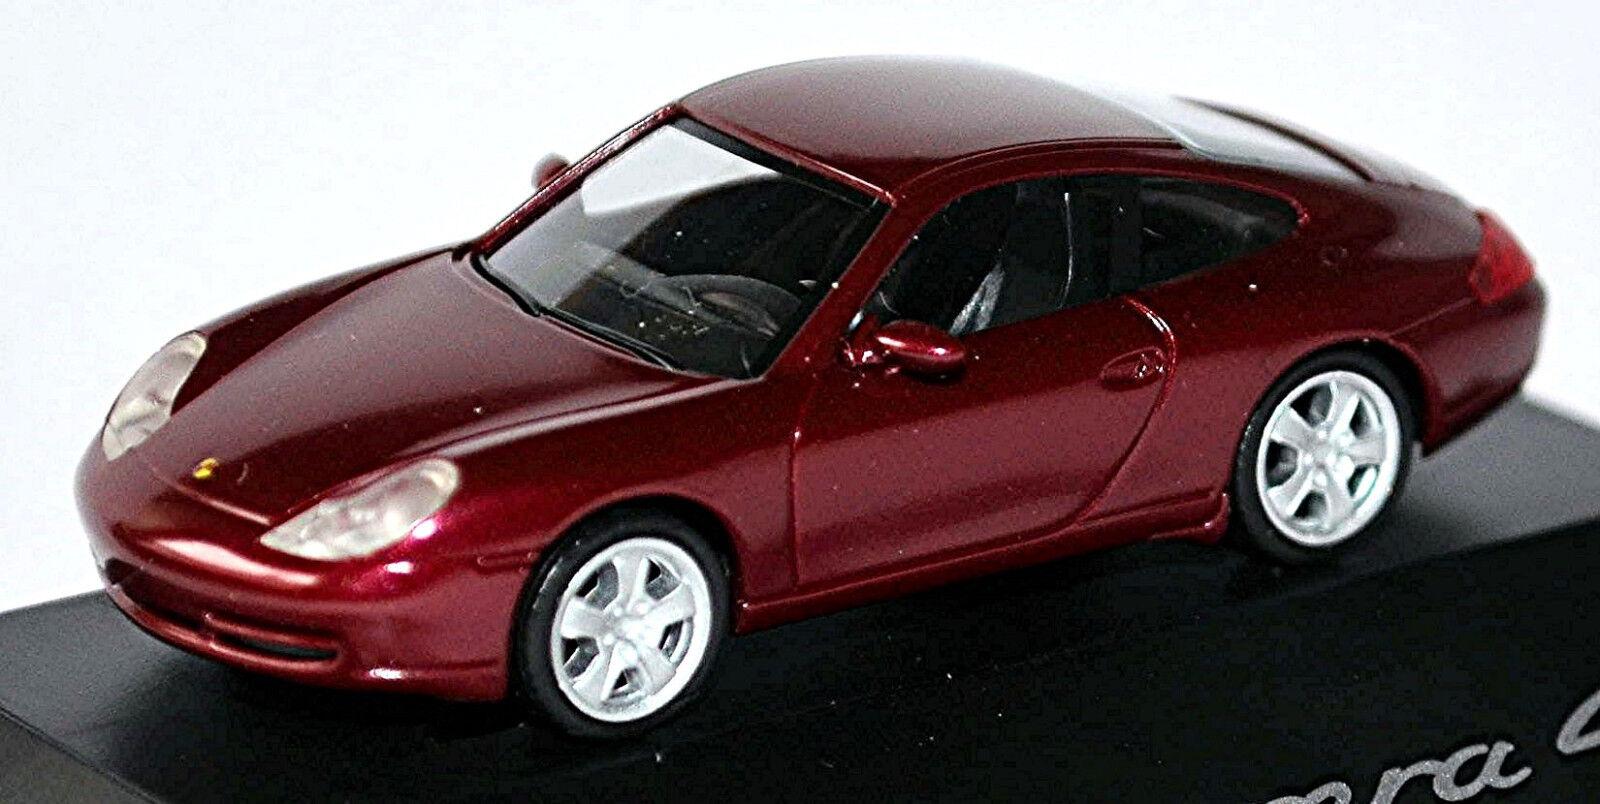 Porsche 911 996 Carrera 4 Coupe 1997-2006 Arena Red Red Metallic 1 87 Herpa